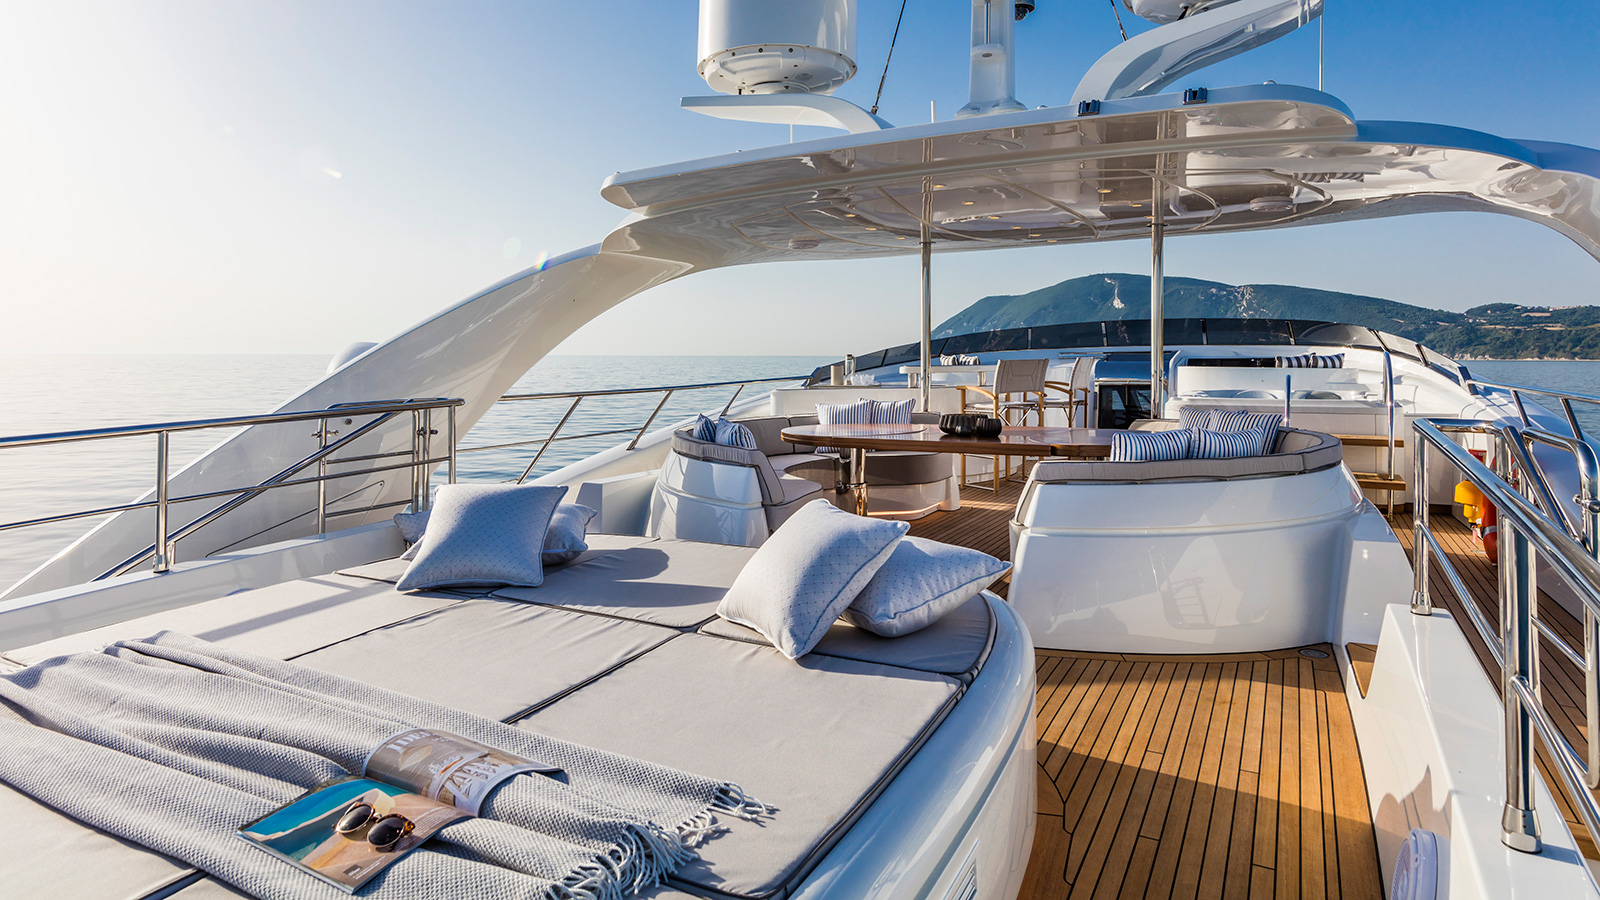 the-sun-deck-of-the-isa-120-yacht-clorinda